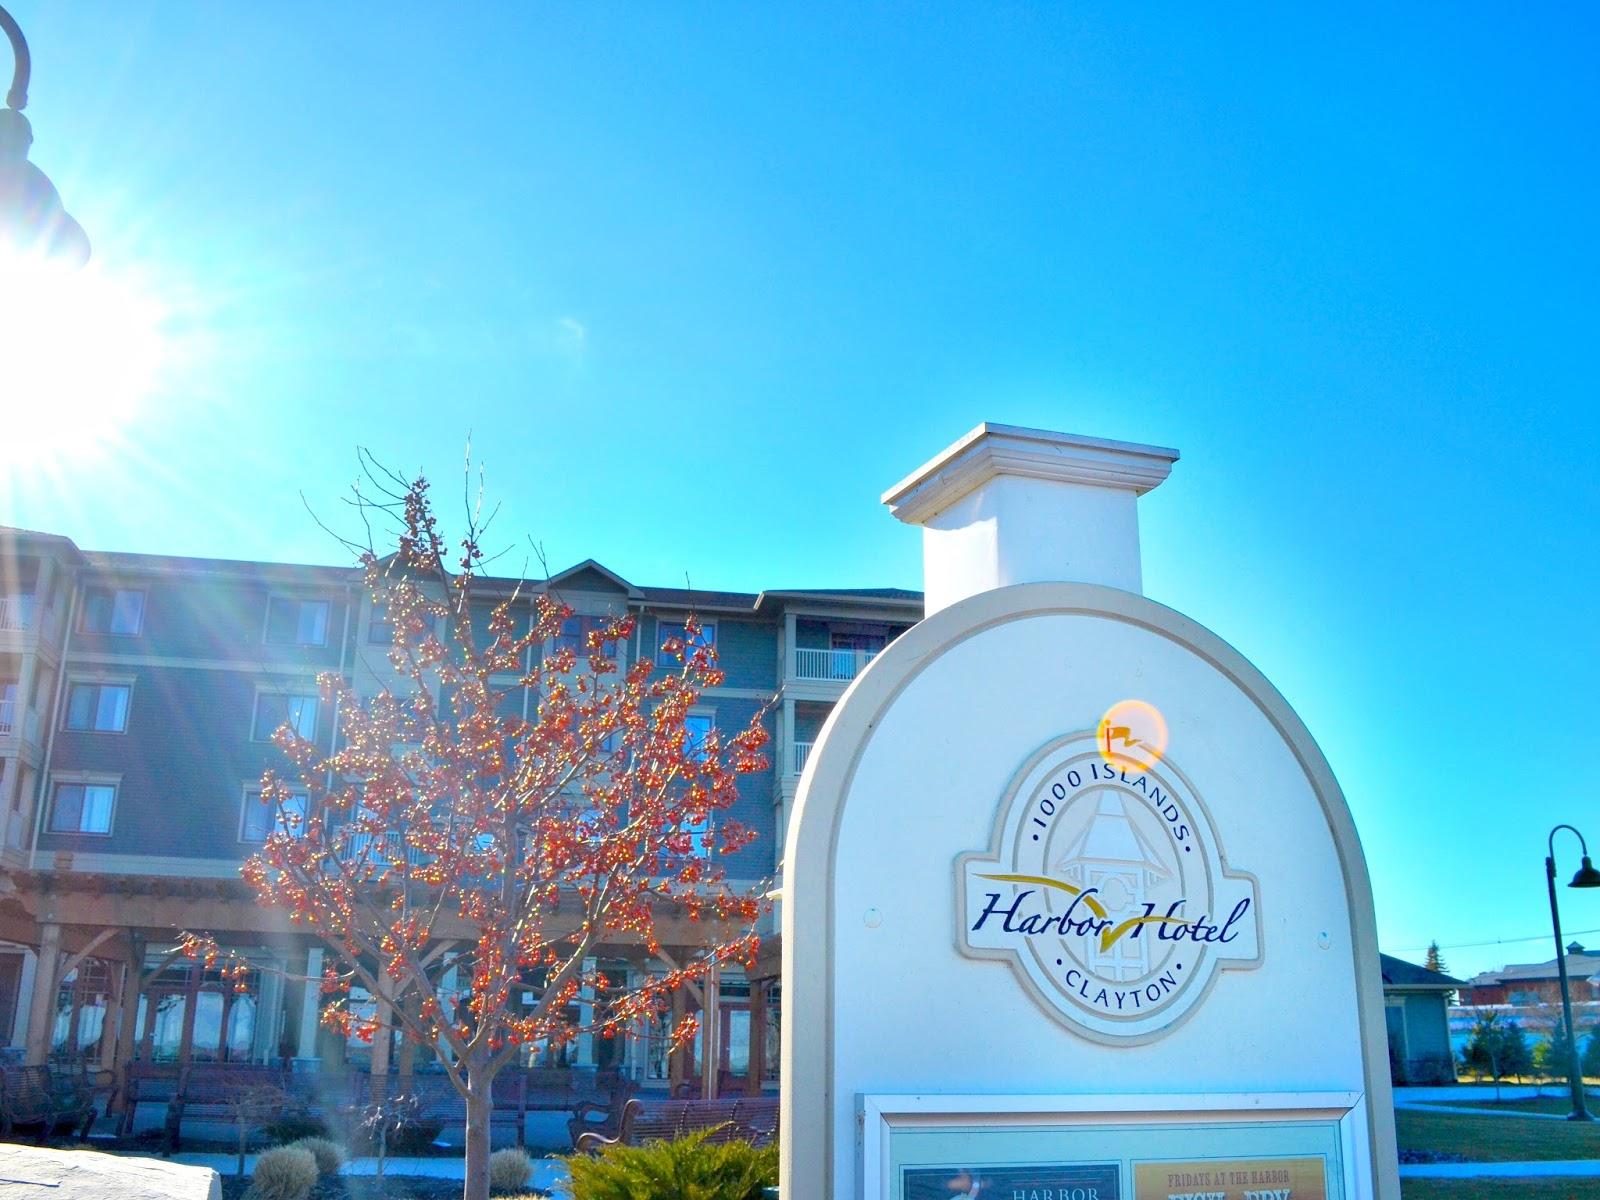 1000 Islands Harbor Hotel in Clayton New York